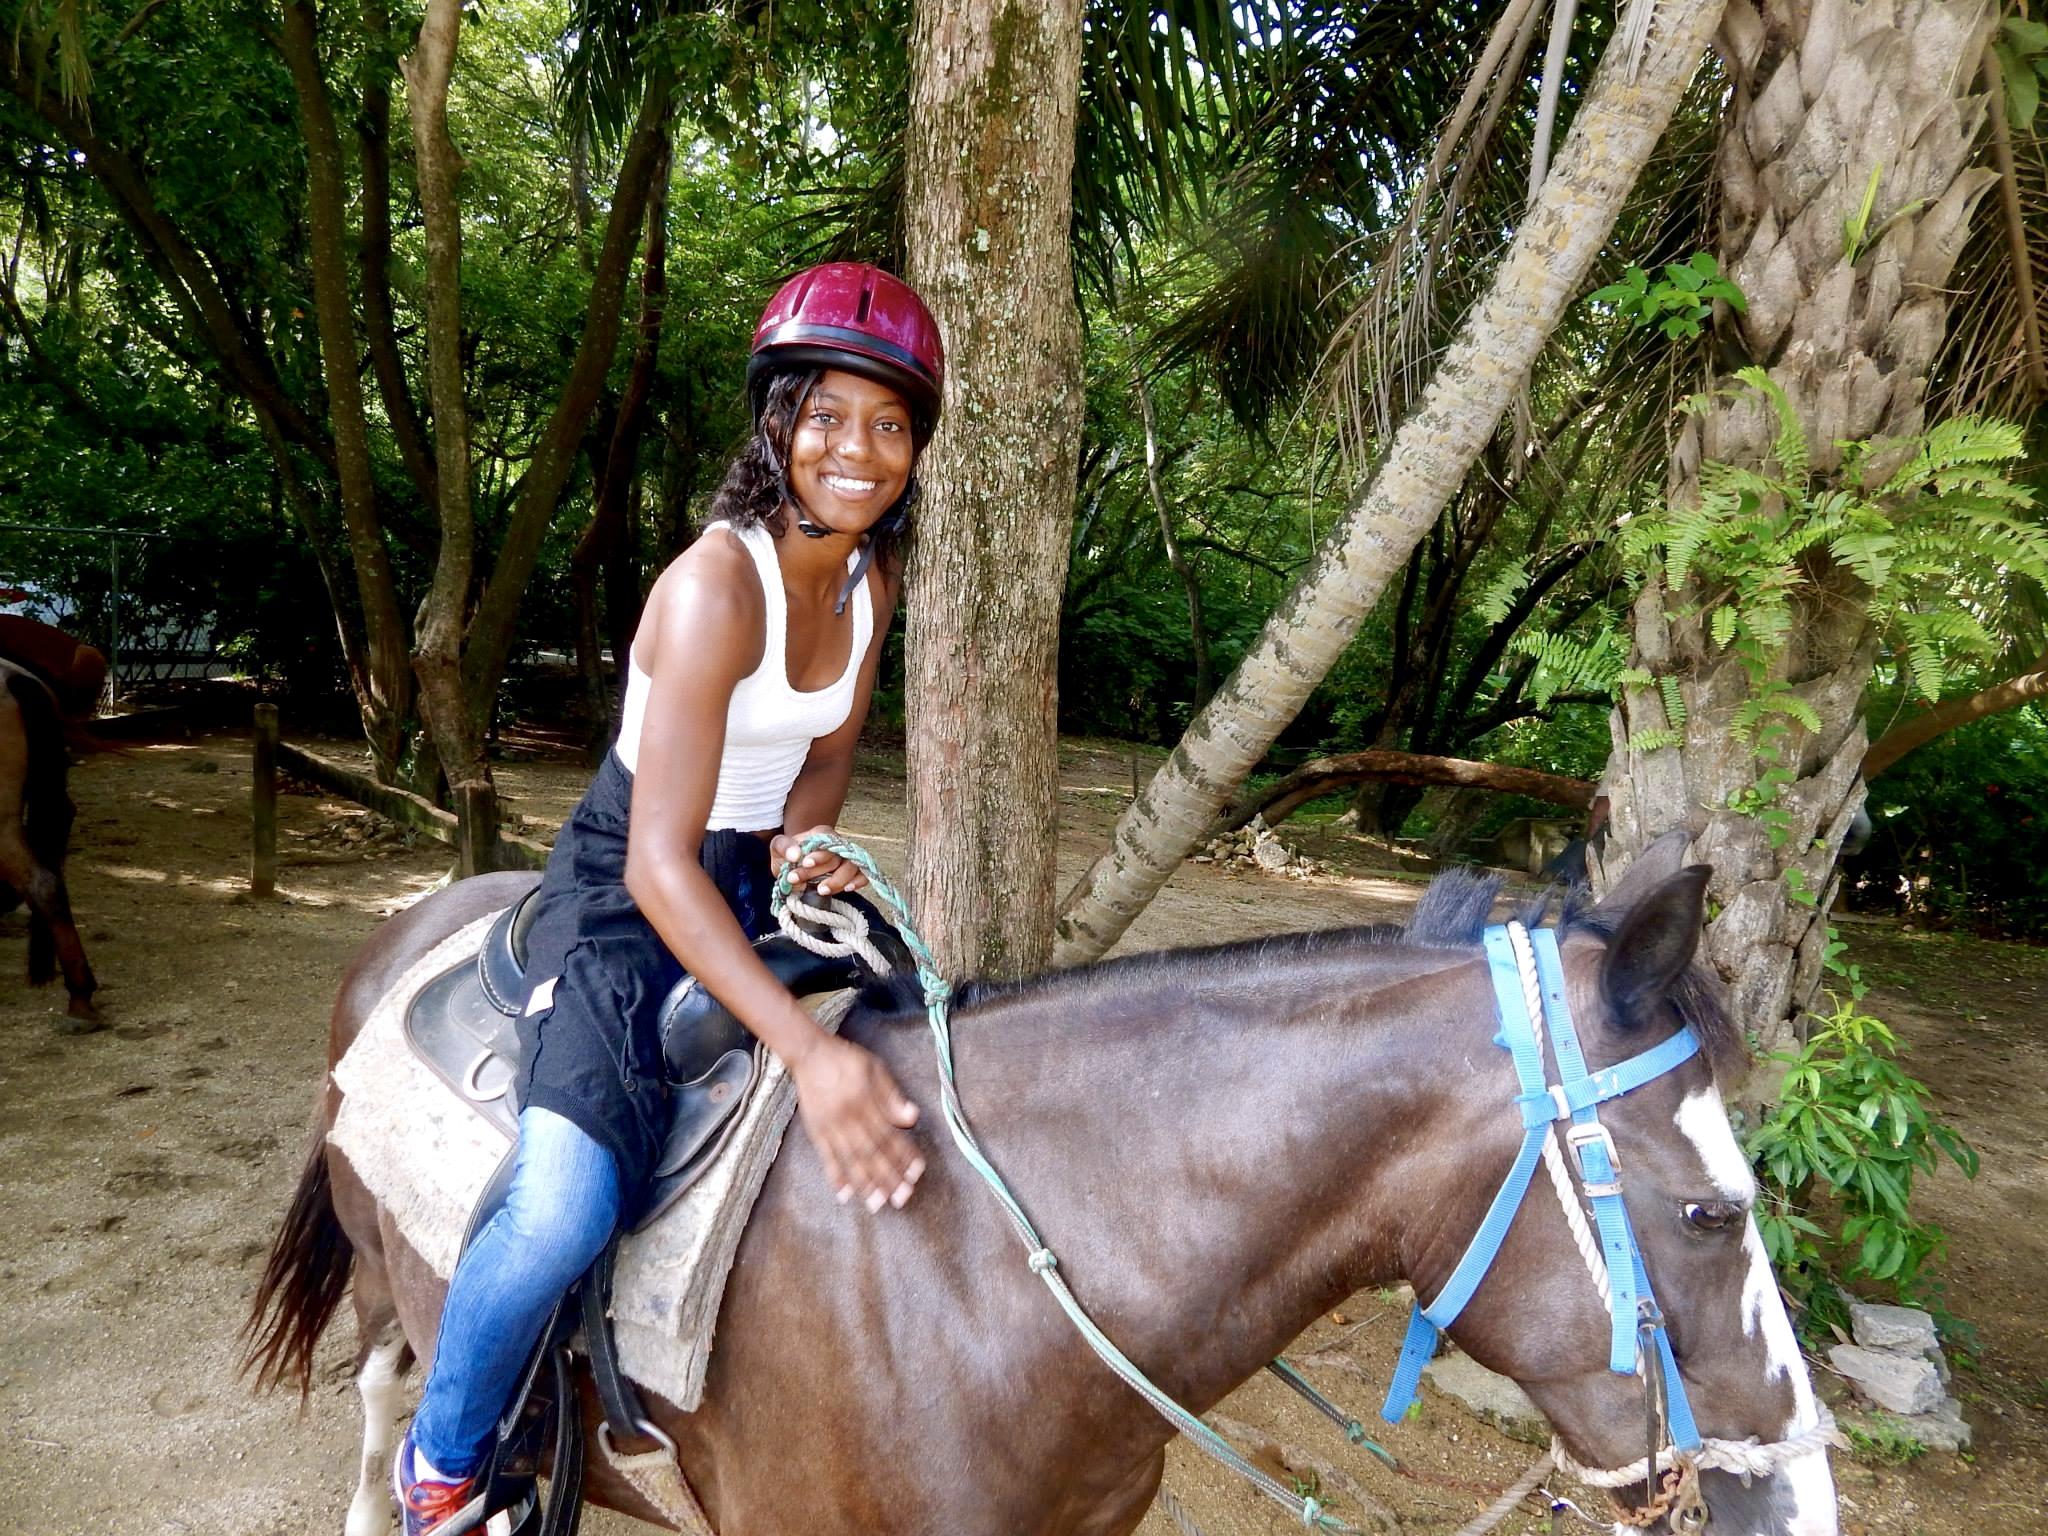 horse back ridin